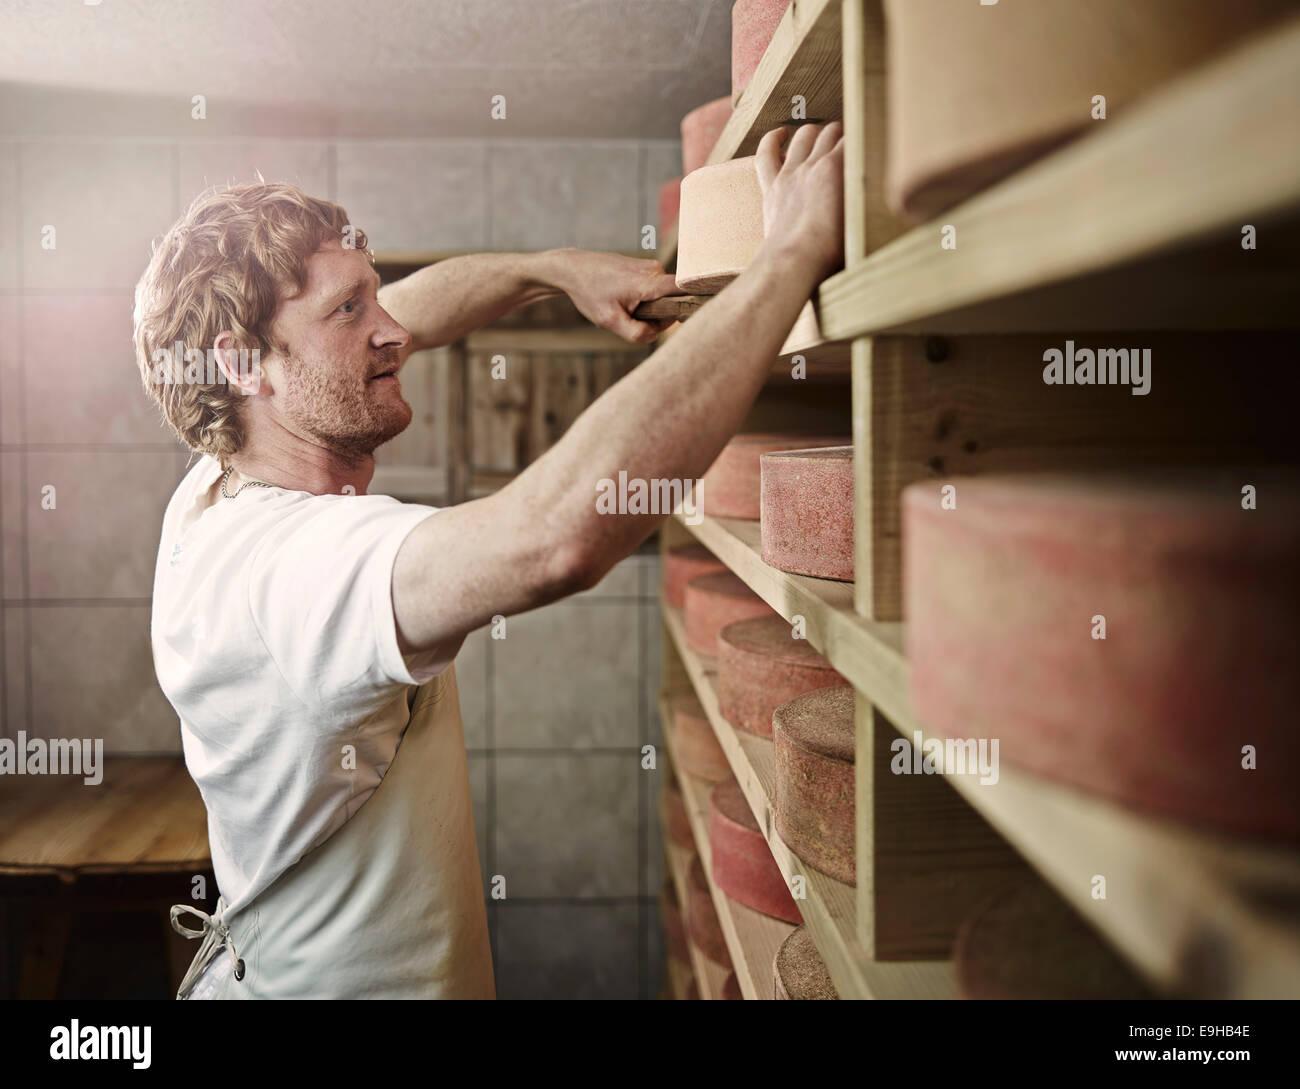 Dairyman storing his mountain cheese, Steinbergalm, Inneralpbach, Alpbach, Tyrol, Austria - Stock Image